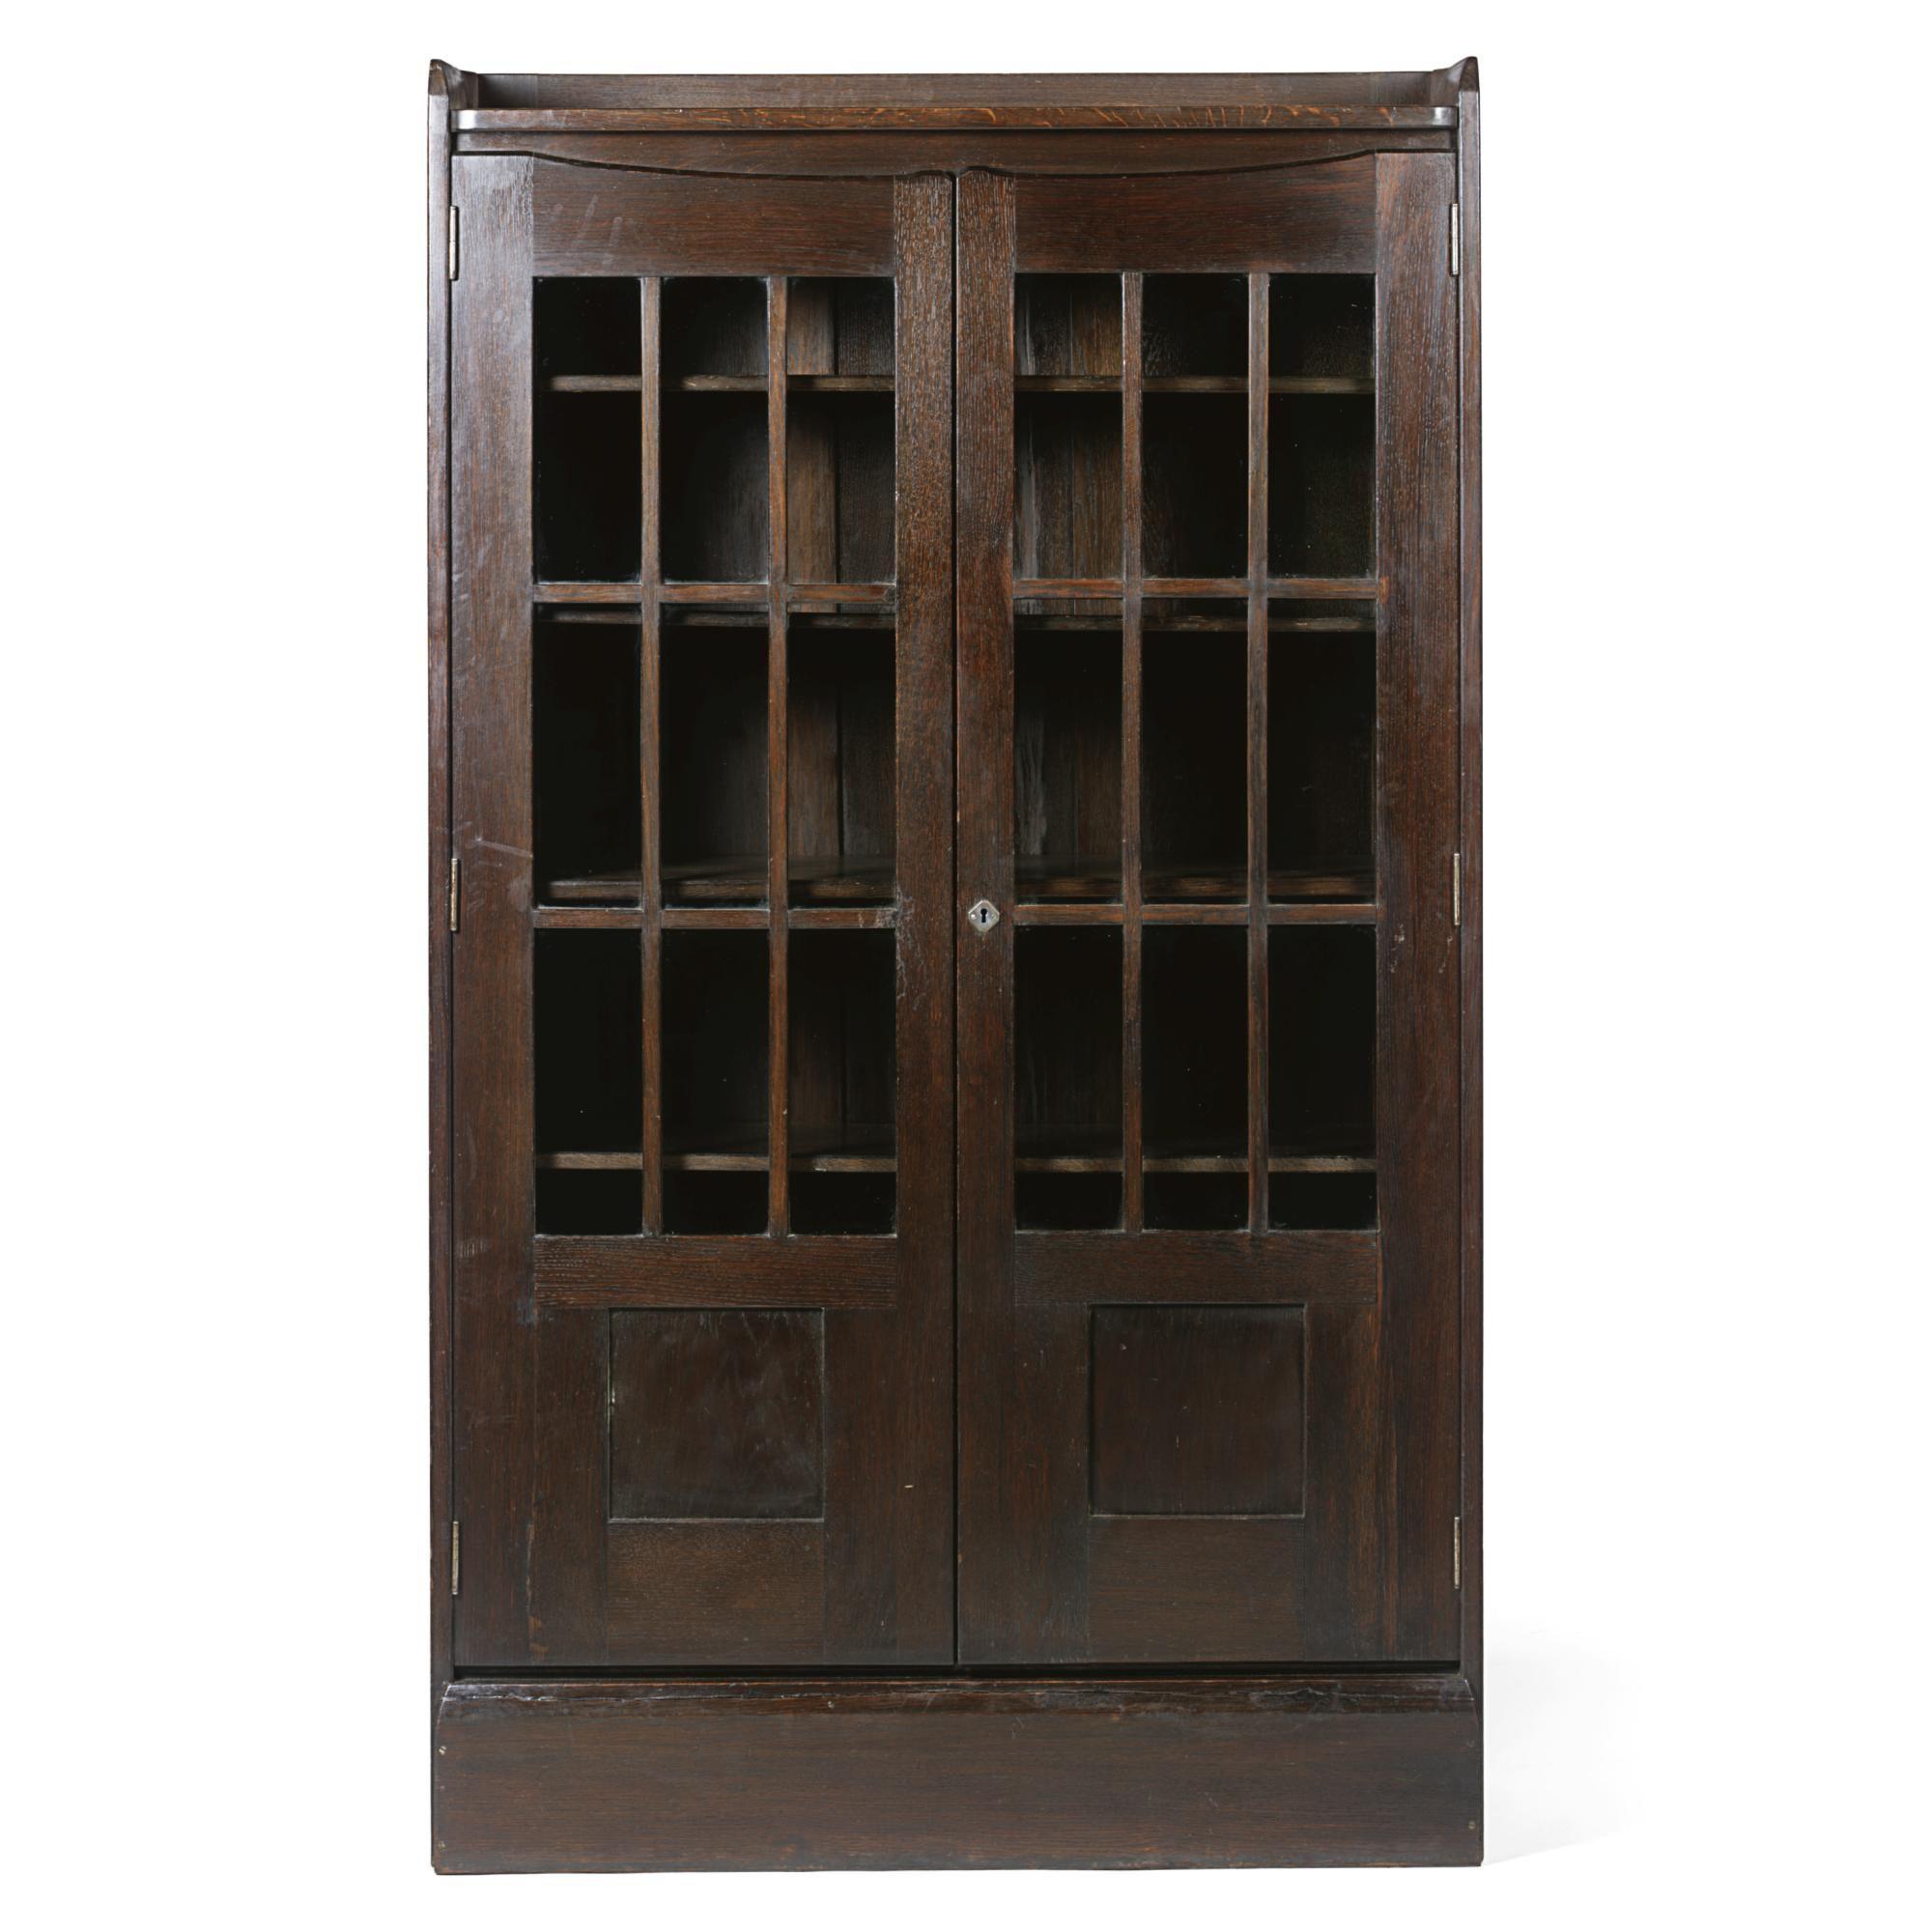 Richard Riemerschmid A Bookcase With Three Quarter Rear Gallery Above Glazed Cupboard Doors Enclosing Five Adjule Shelves High By Wide Deep